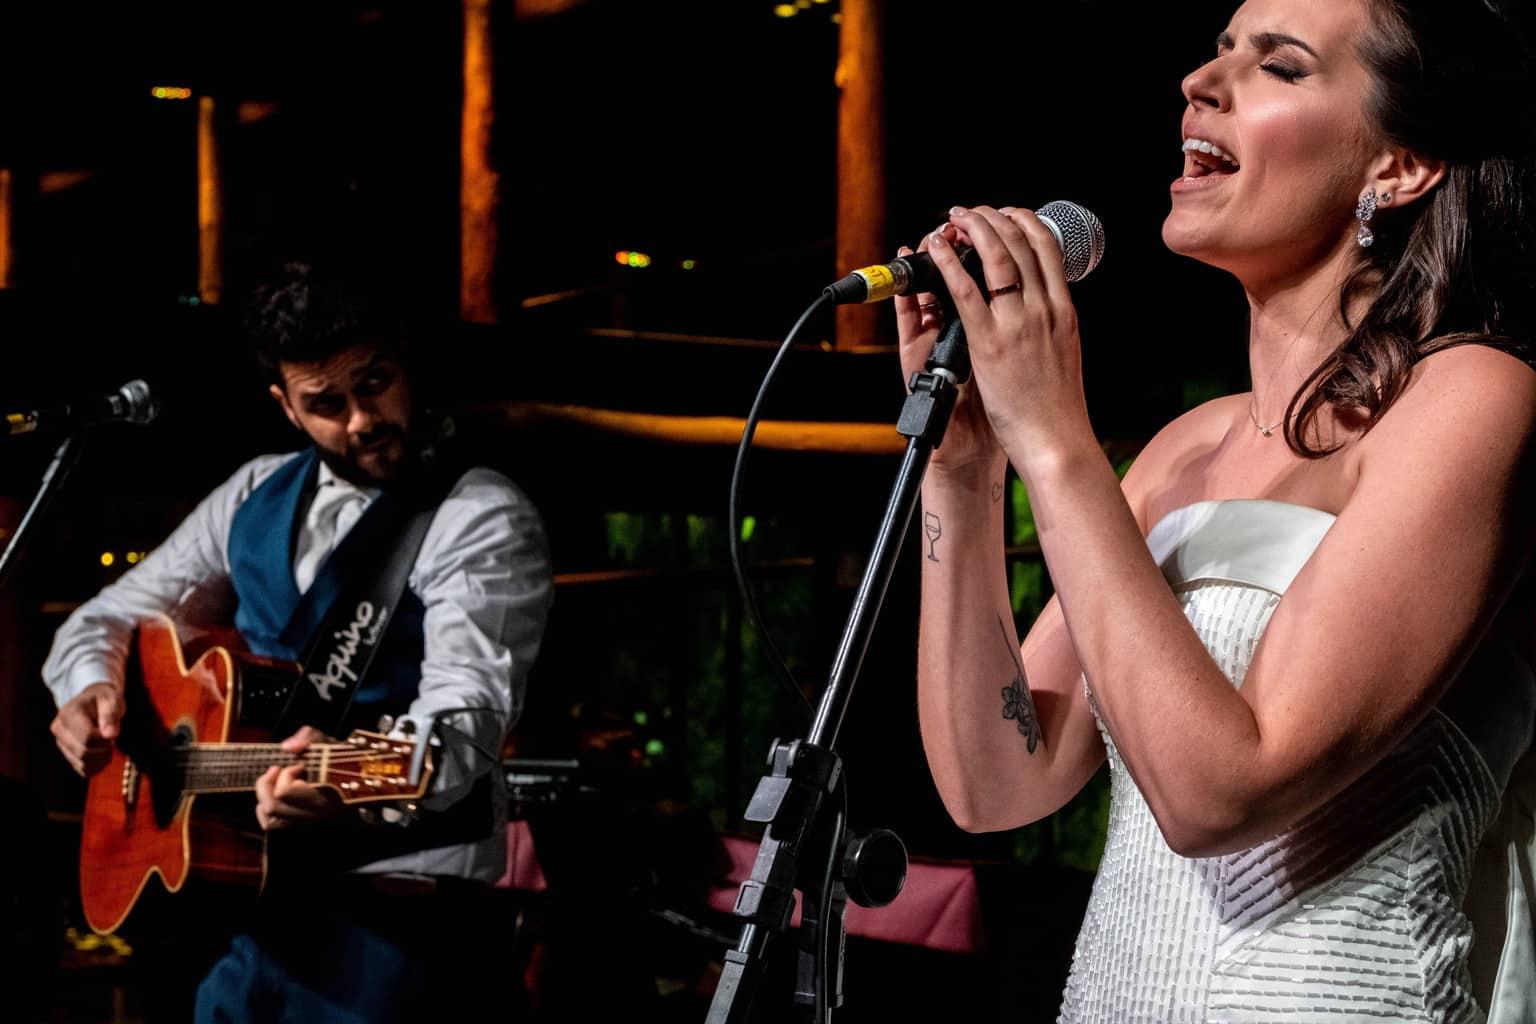 Bel-Benkler-eventos-Casamento-Ariane-e-Matheus-cerimonia-decoracao-contemporanea-fotografia-Rafael-Bigarelli-noivos-na-pista-Spazio-Giardini-27